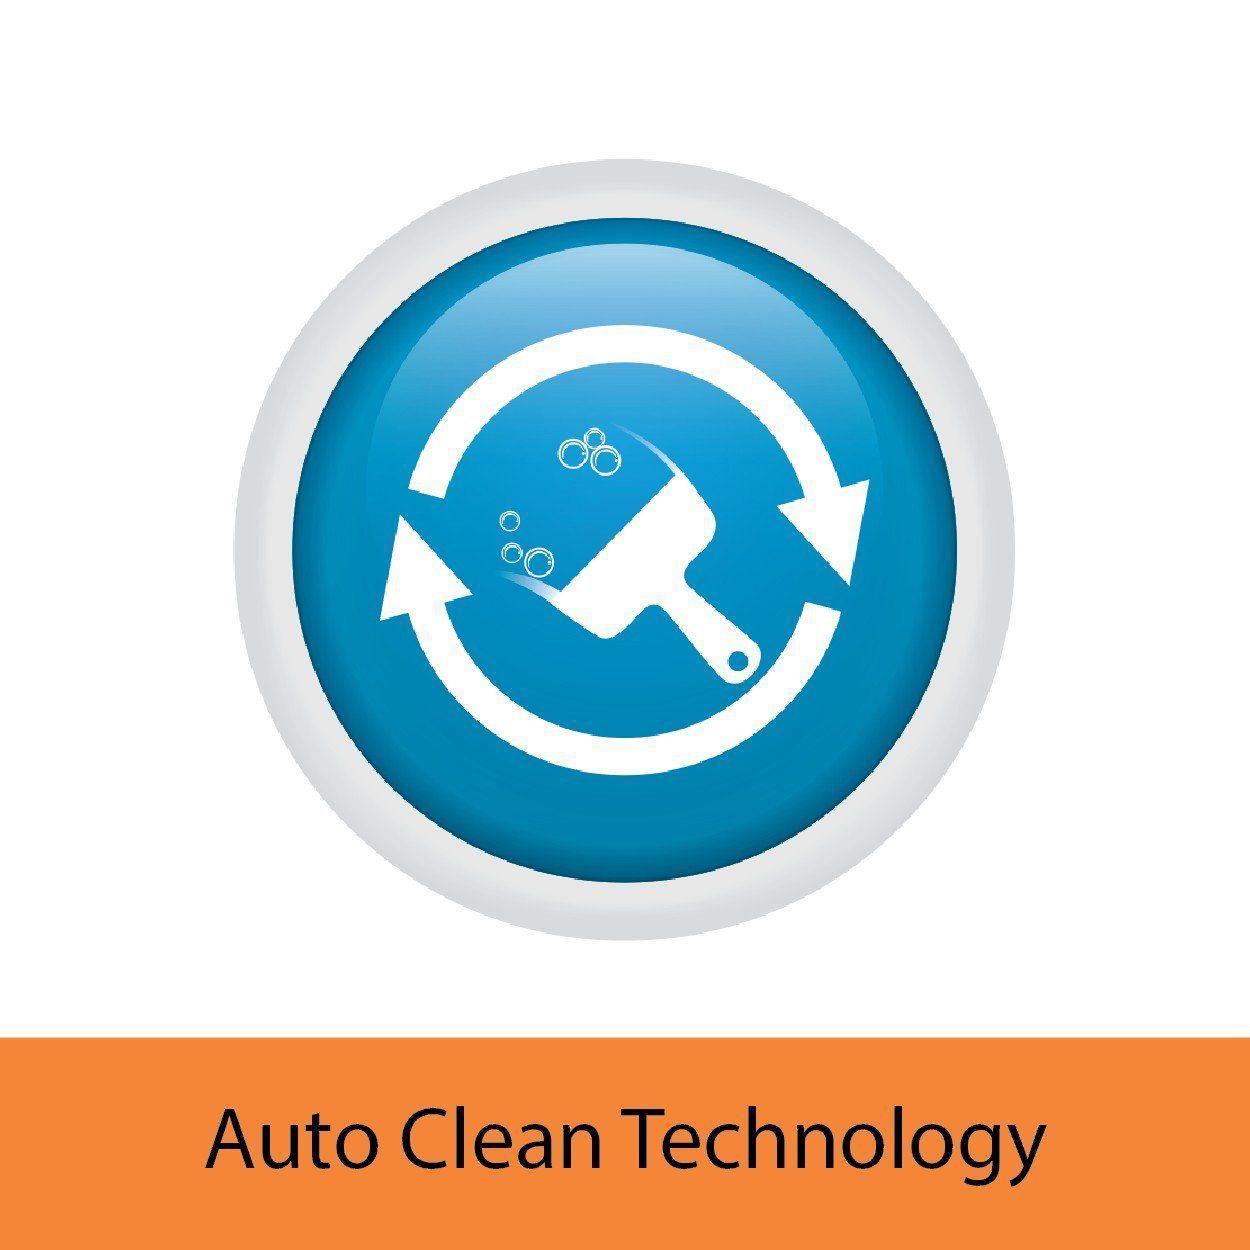 Hindware Cleo 60 Auto Clean 1200 m3/hr Chimney with 5 Year Warranty ...